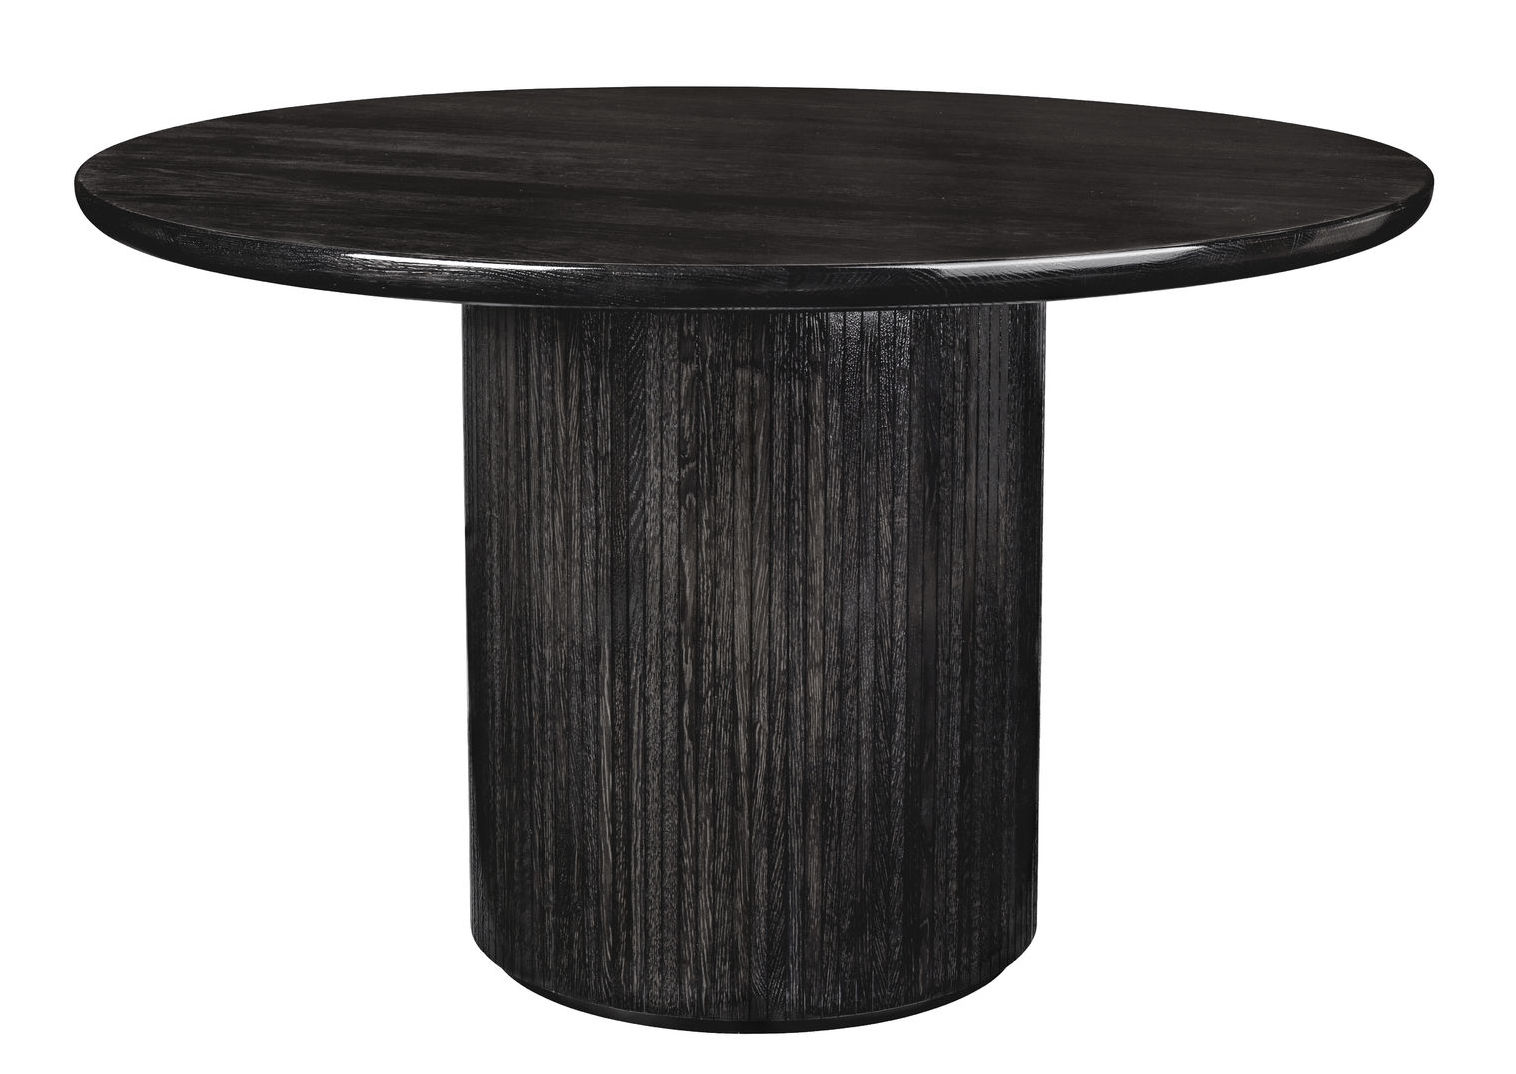 Gubi Moon Tables Design Space Copenhagen 2015